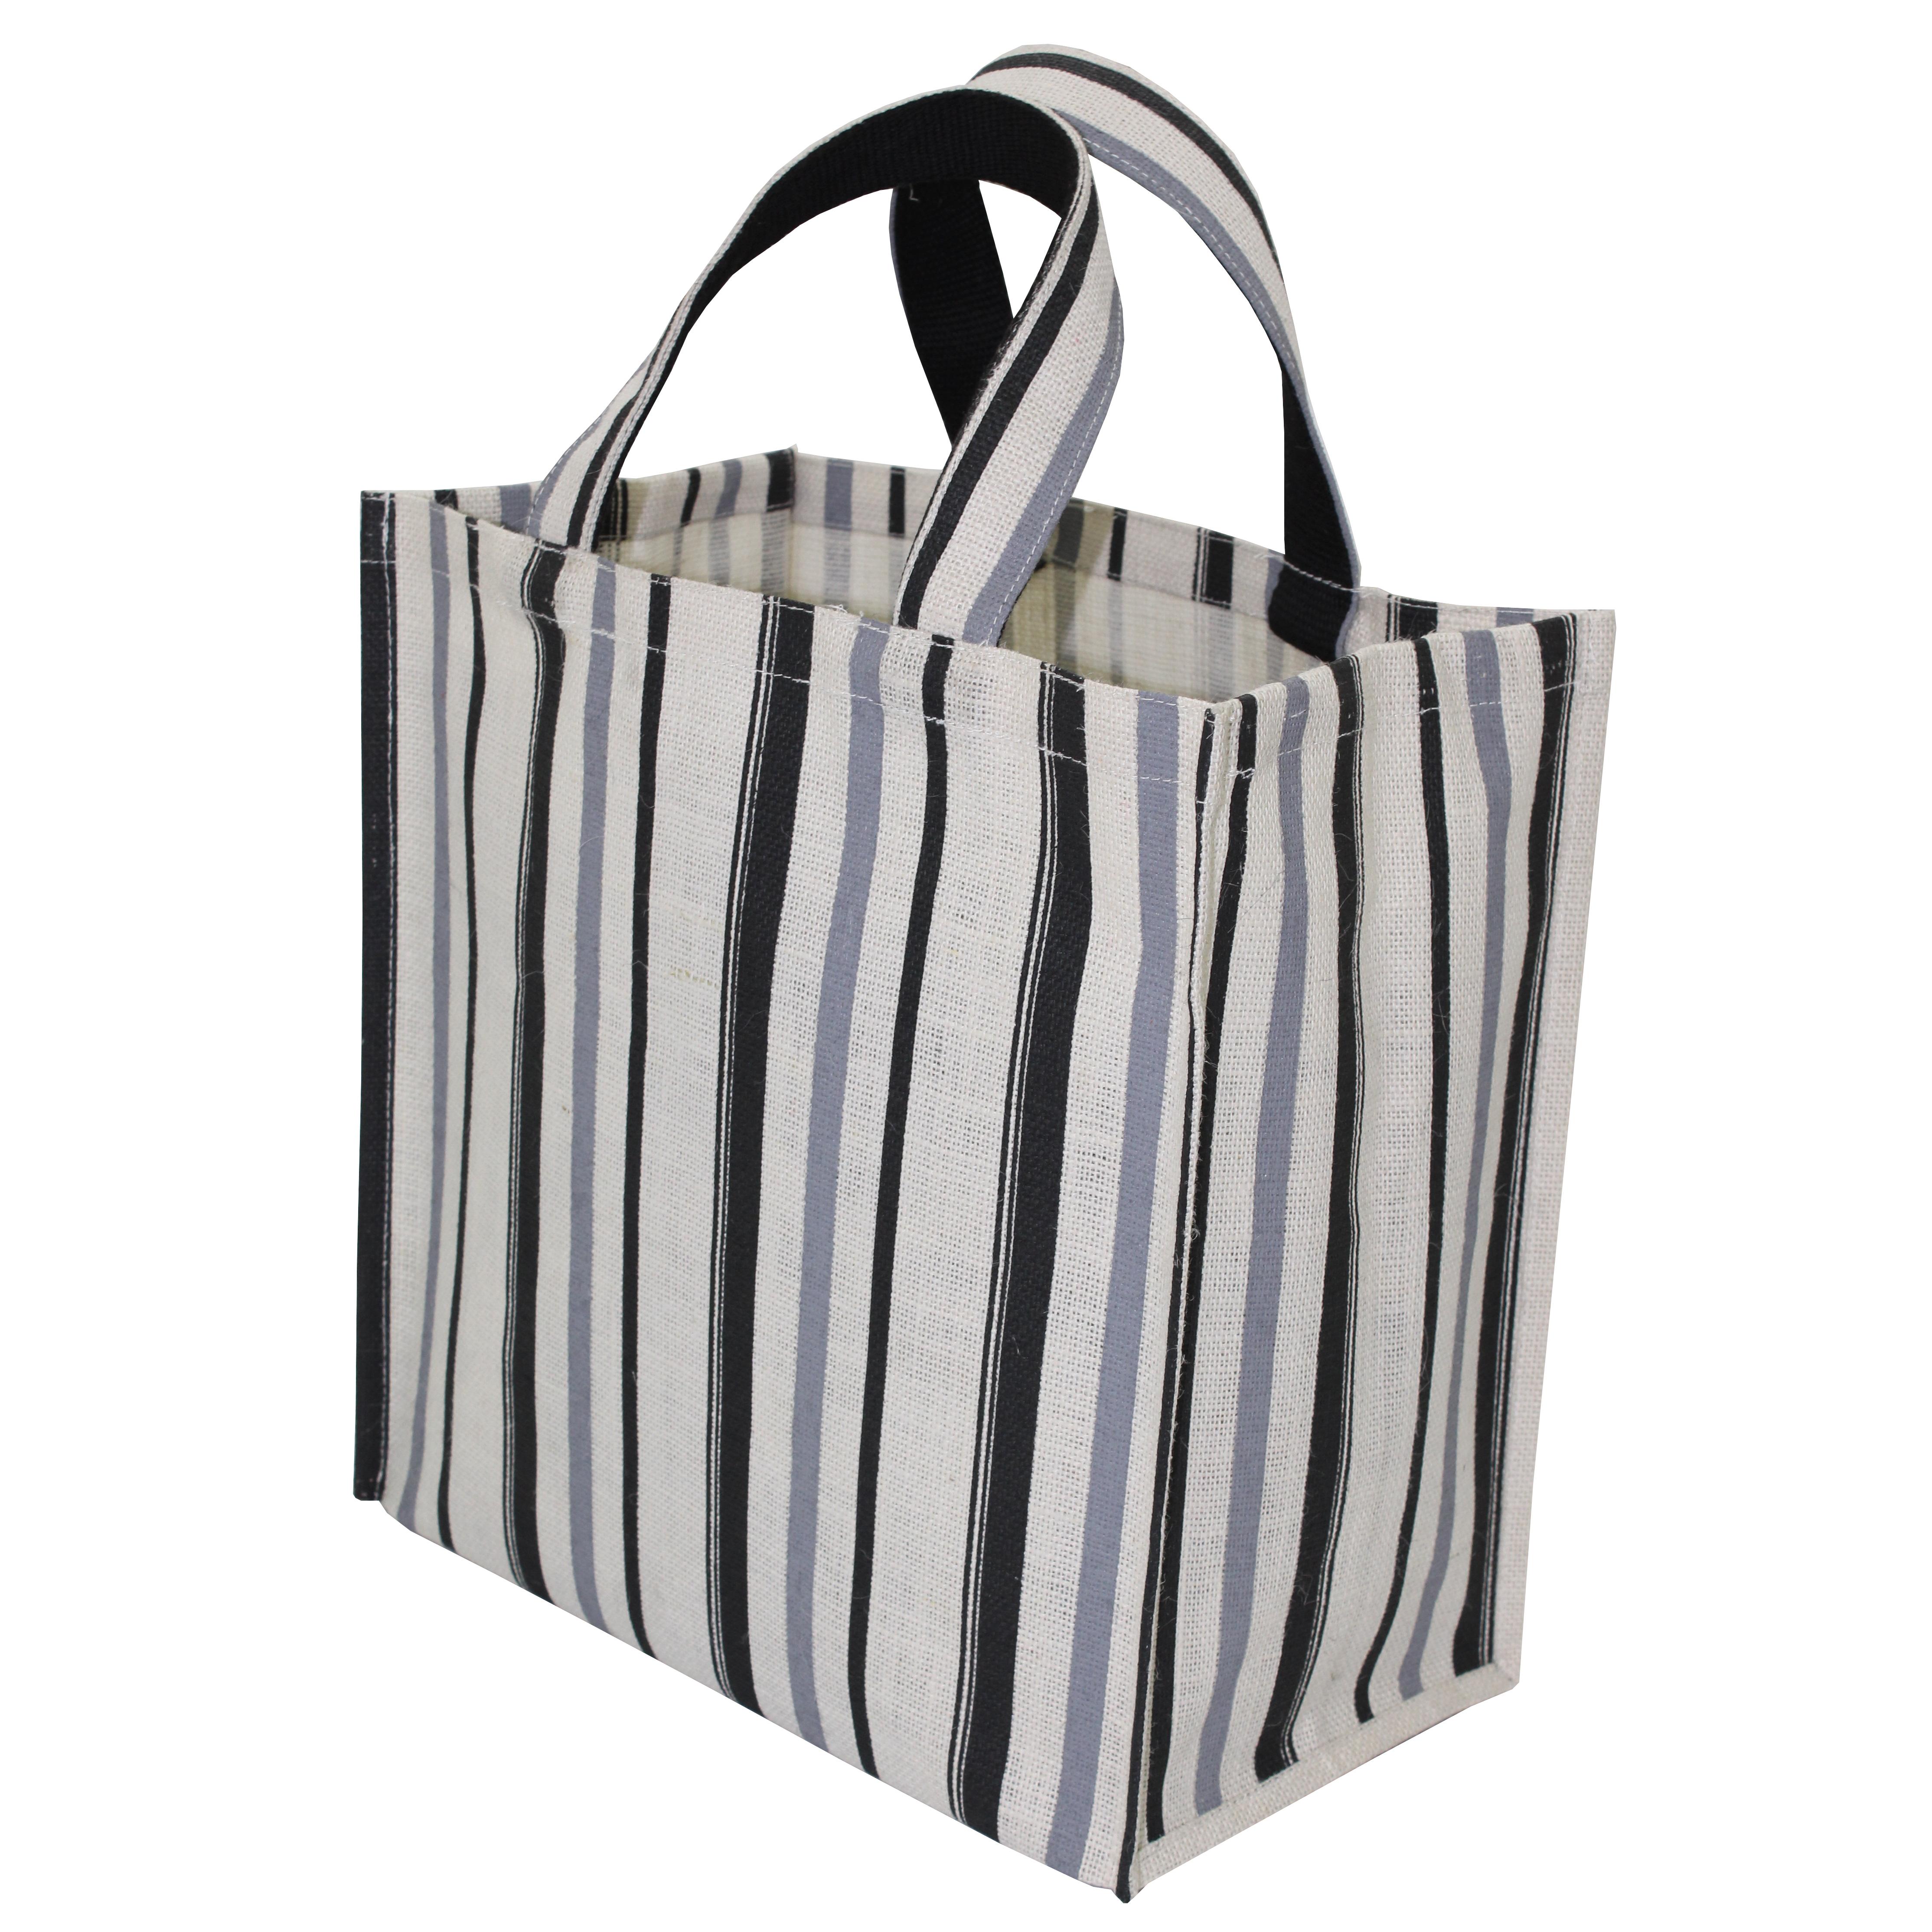 Pp Laminated Jute Tote Bag &  Jute Handle Padded With Webbing